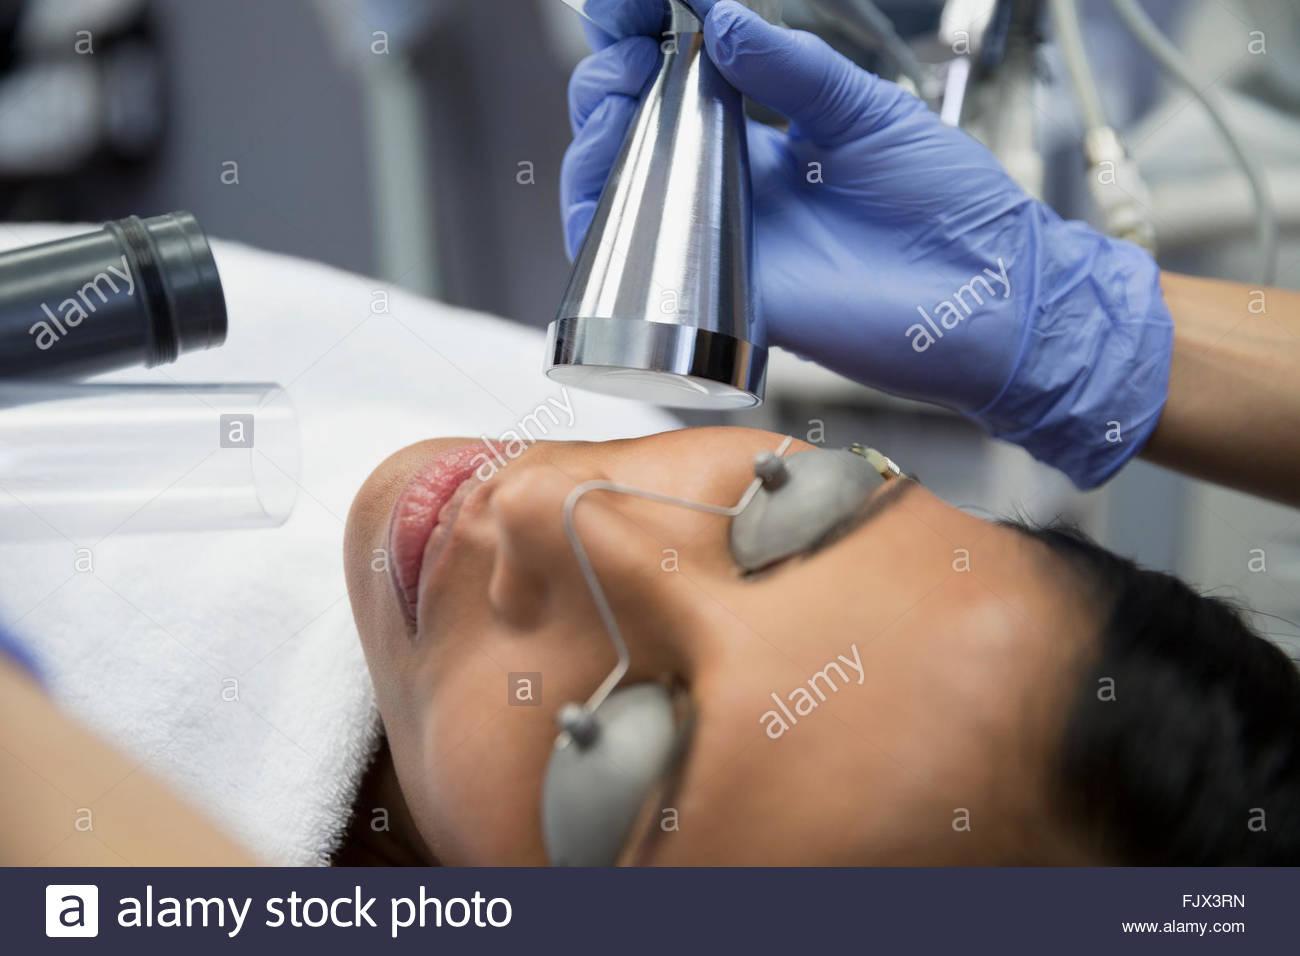 Woman receiving facial treatment Photo Stock